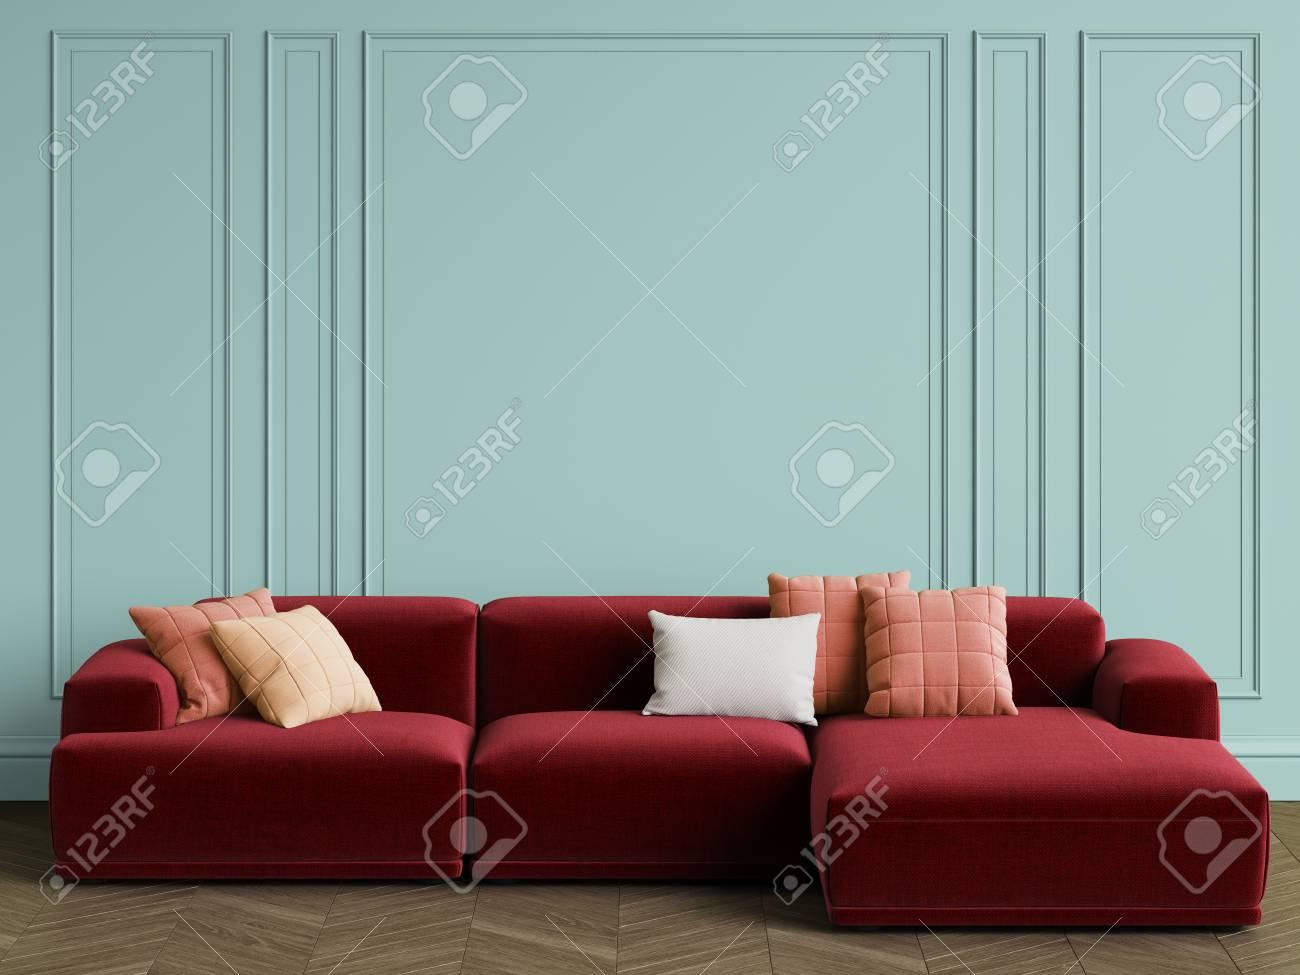 Modern Scandinavian Design Sofa In Interior. Walls With Moldings ...